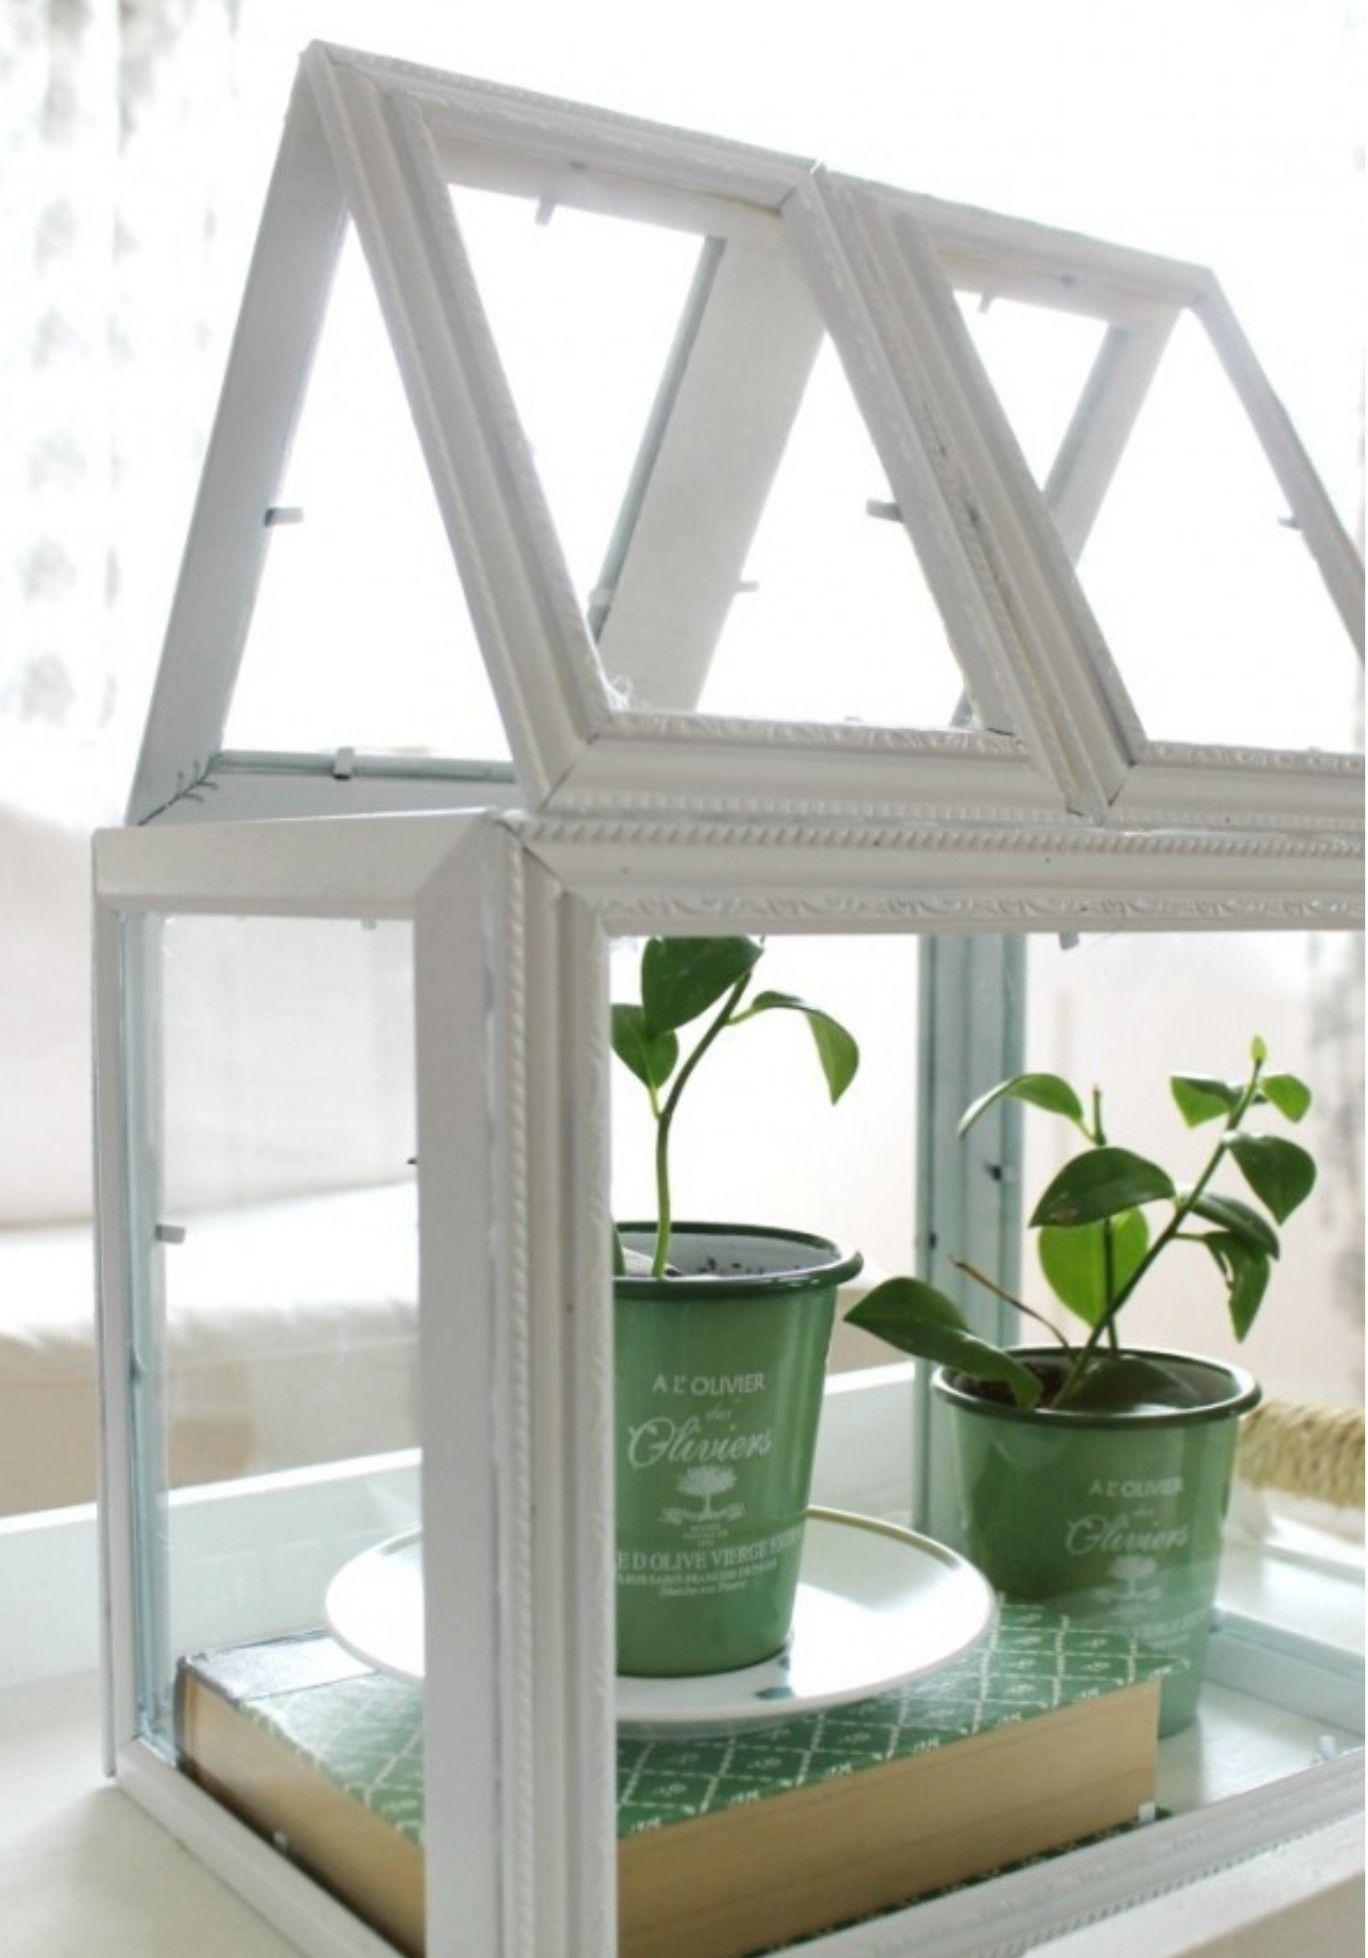 Table top greenhouse Frames (2) 8x10 (2) 5x7 (4) 4x6 | crafty stuff ...